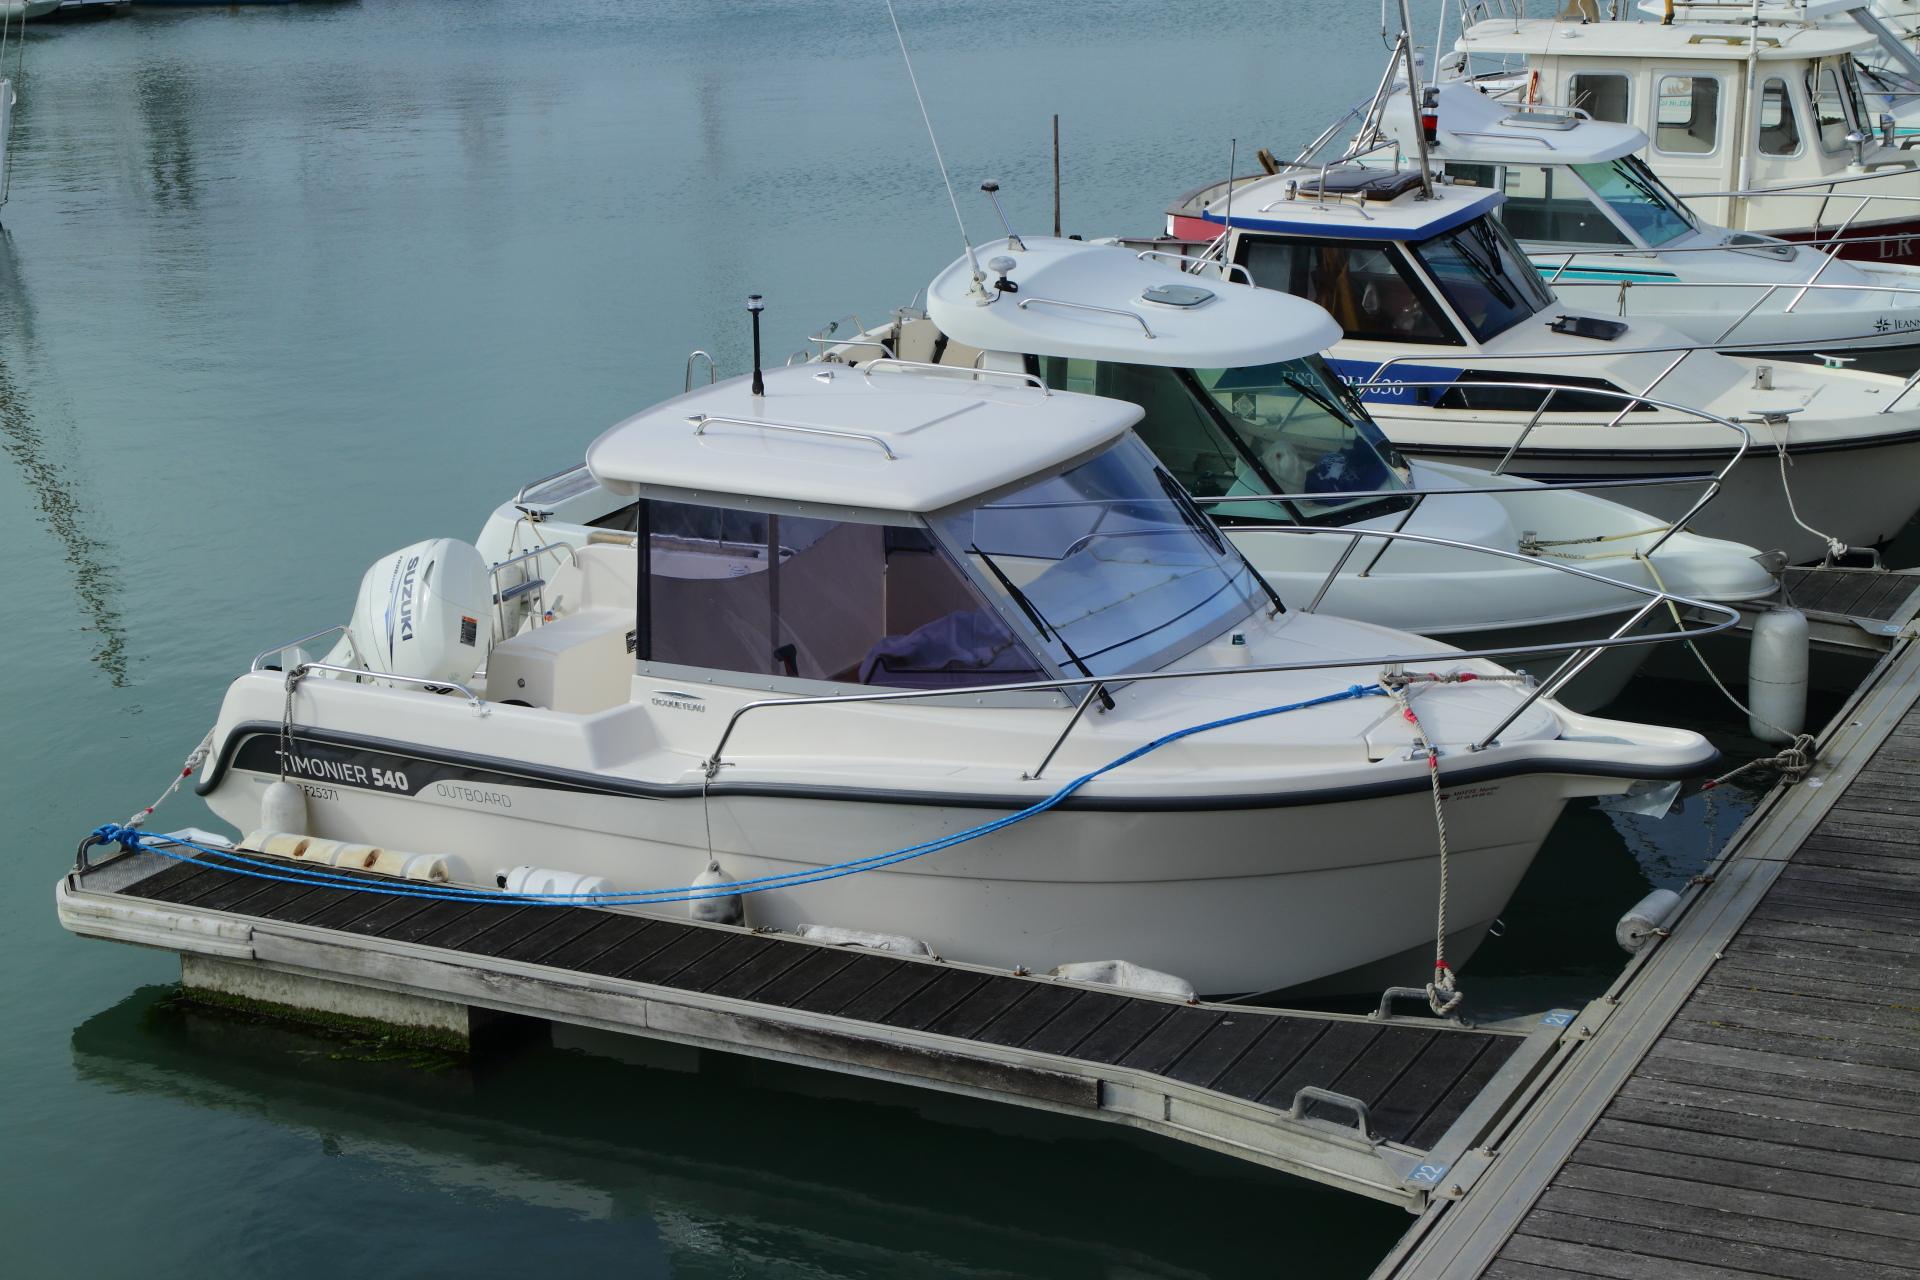 pilothouse boat ocquetau ocqueteau sport boat range motor boat